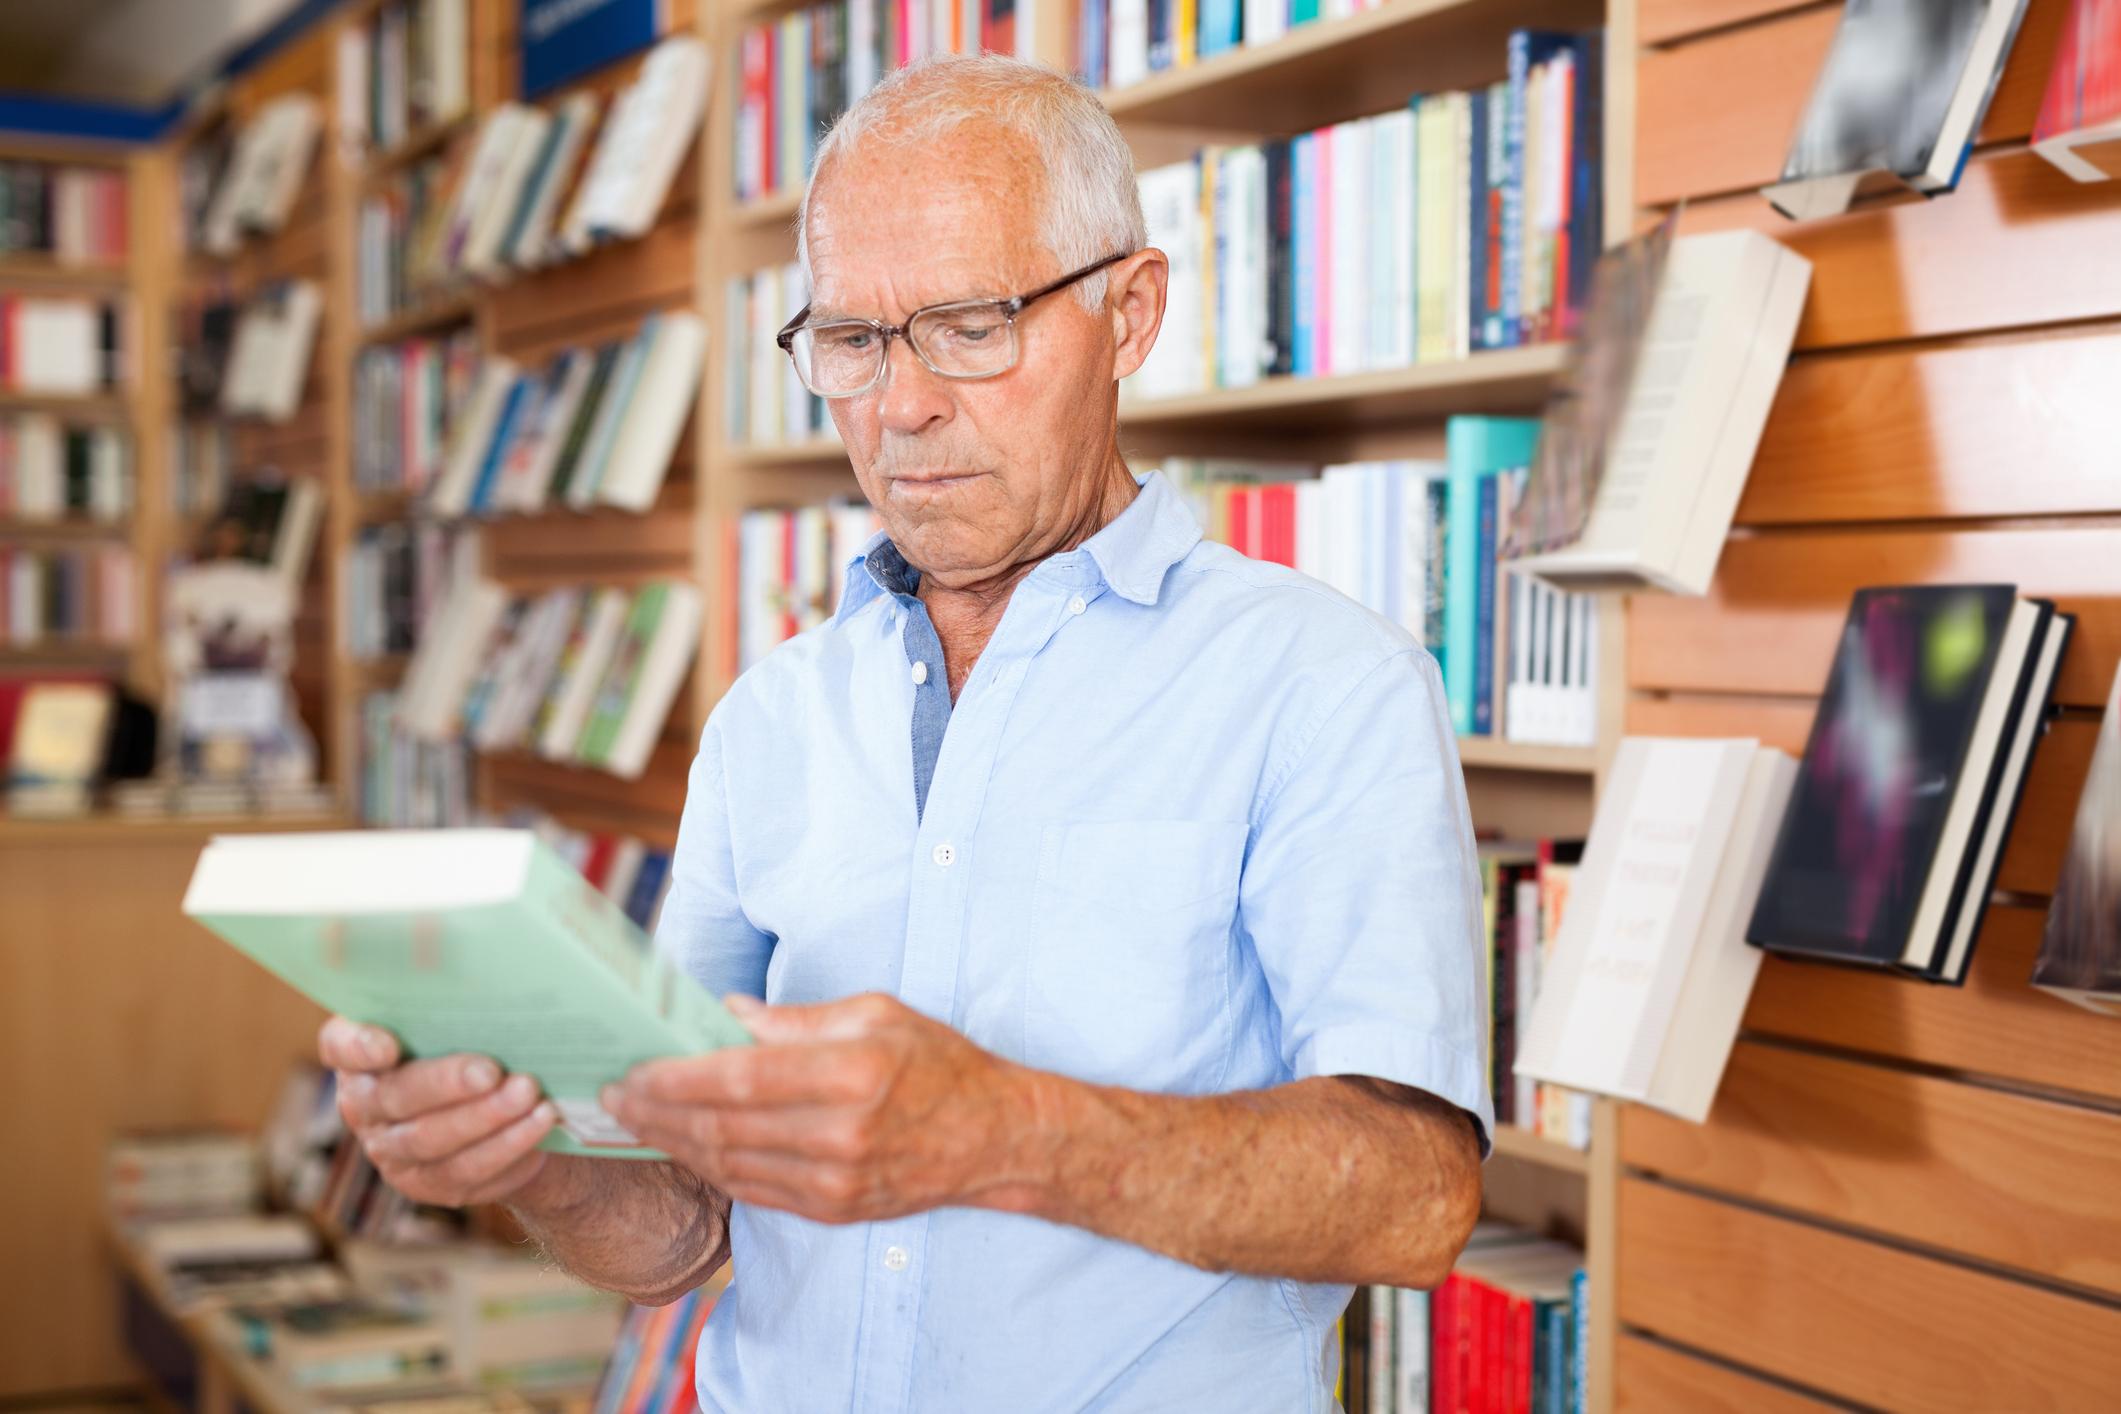 Senior man in bookstore holding book